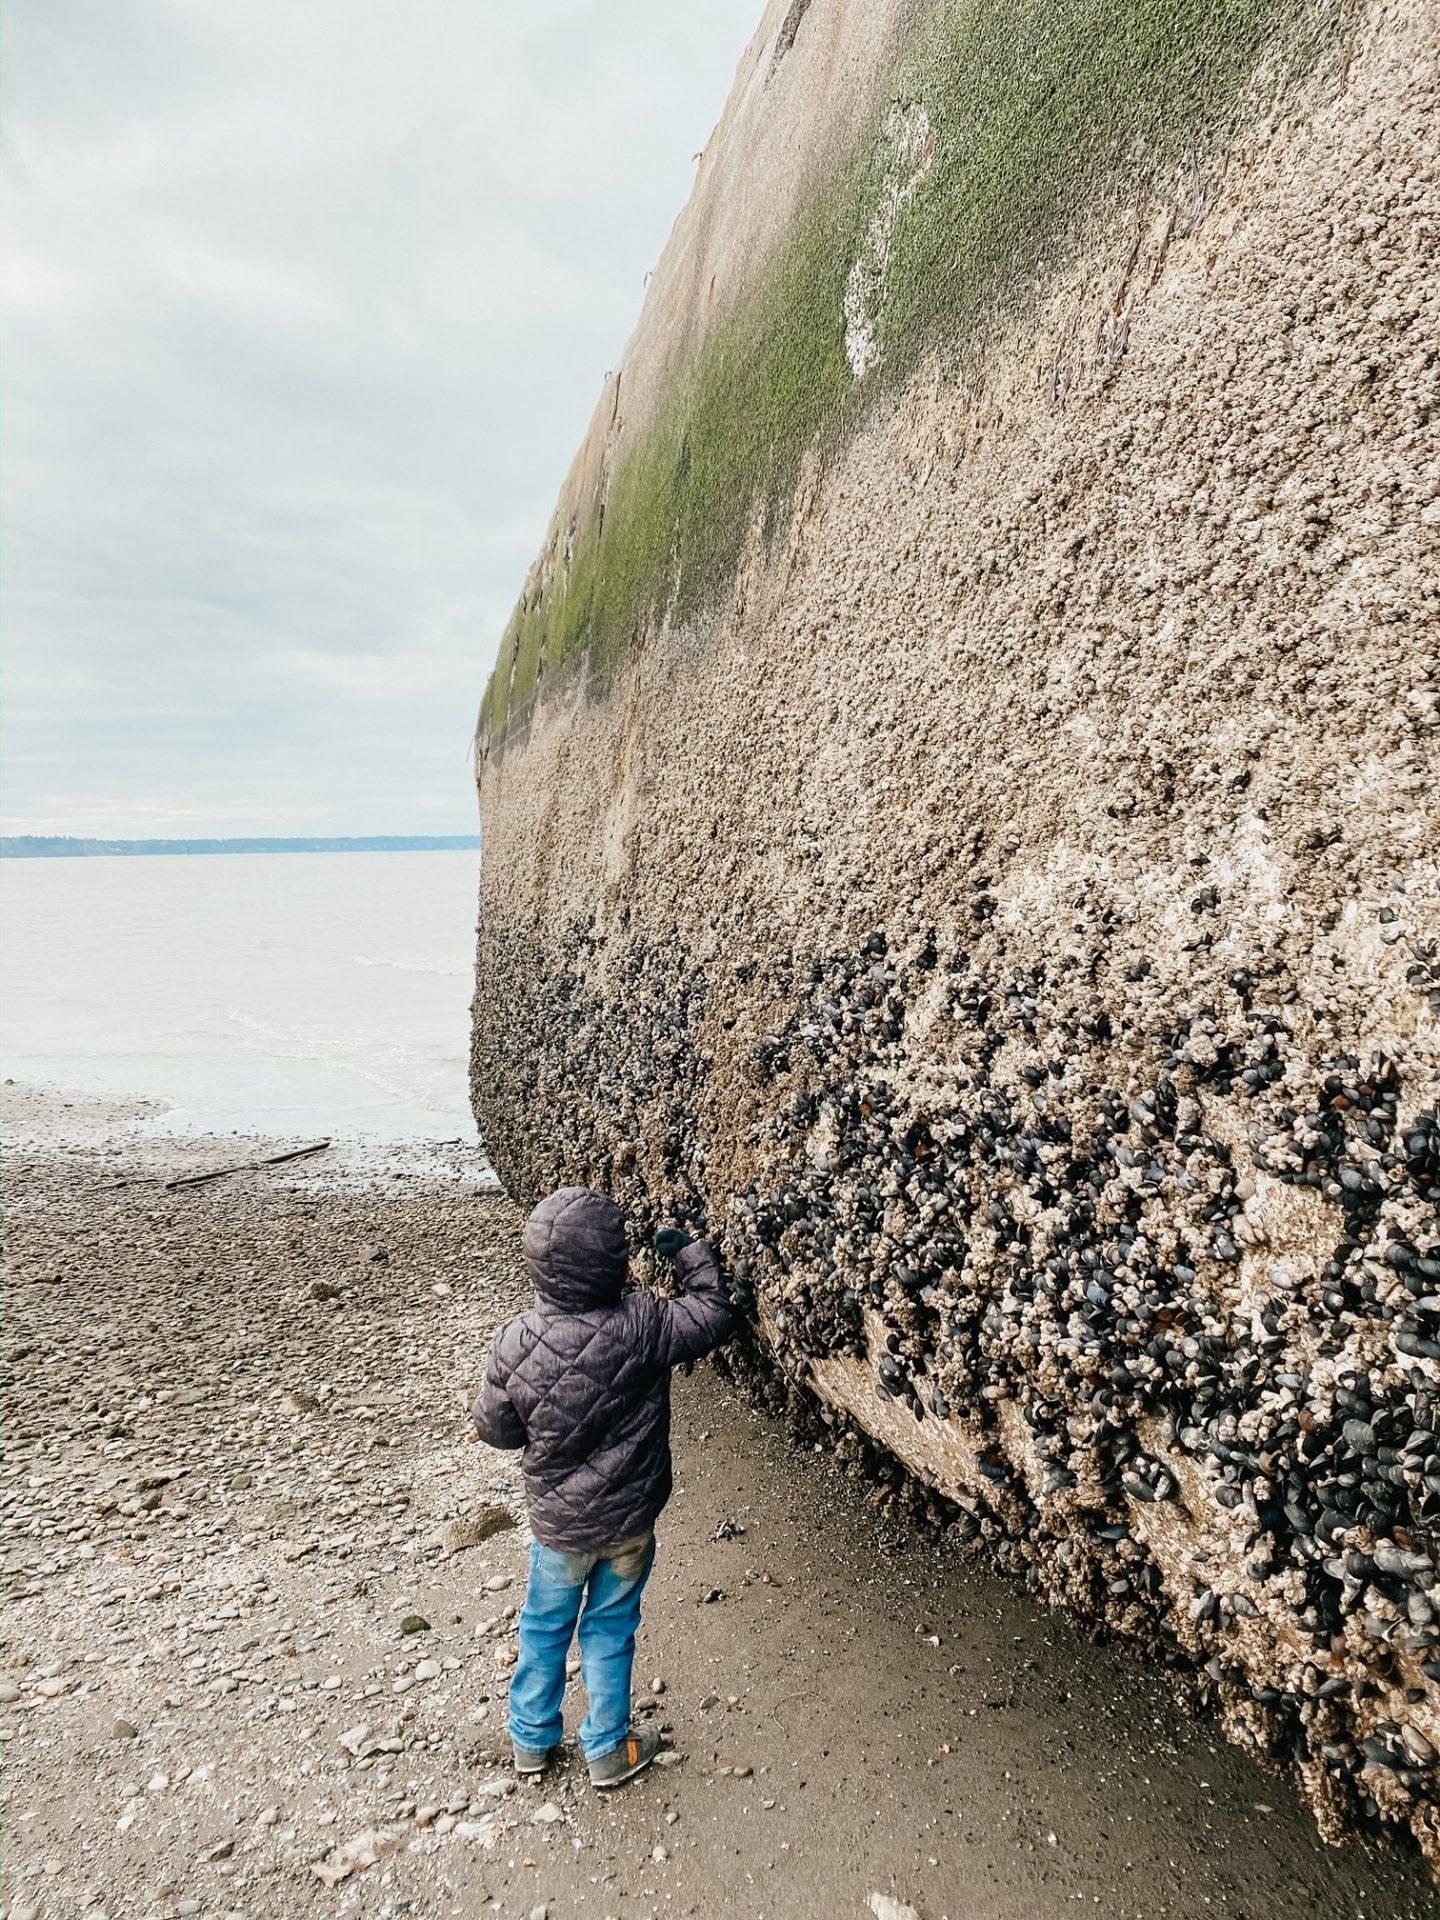 exploring dupont shipwreck